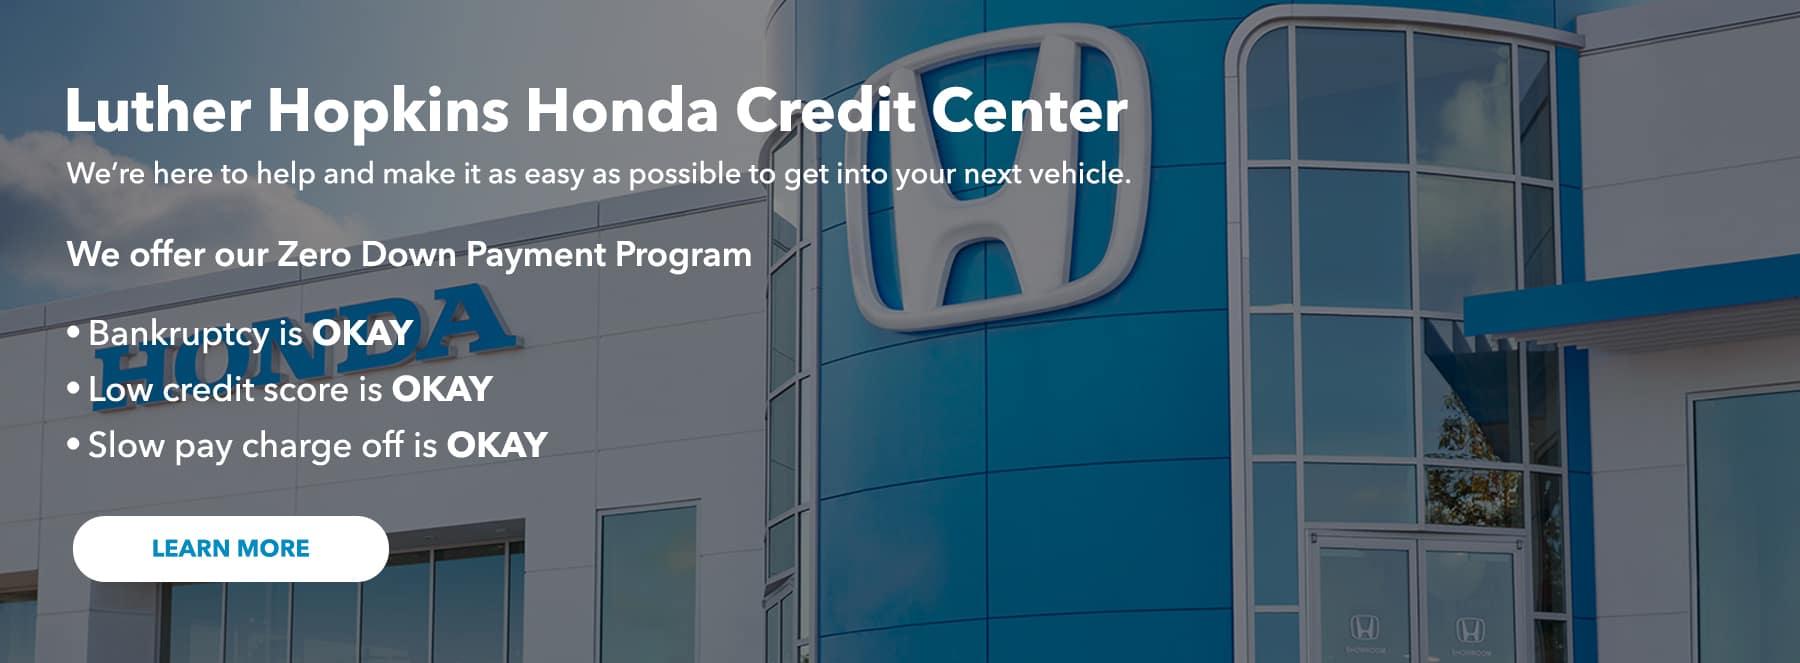 Hopkins Honda Credit Center